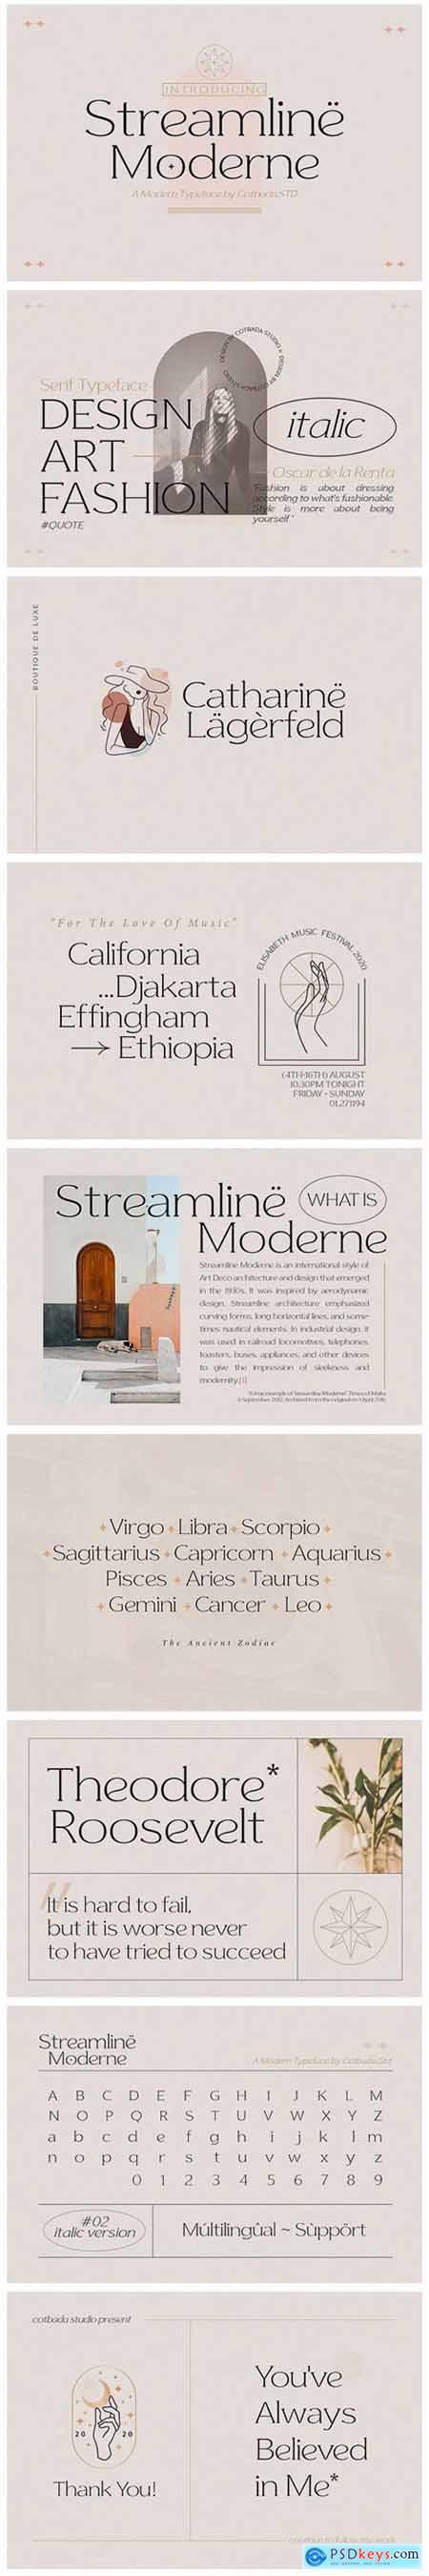 Streamline Moderne 5489481